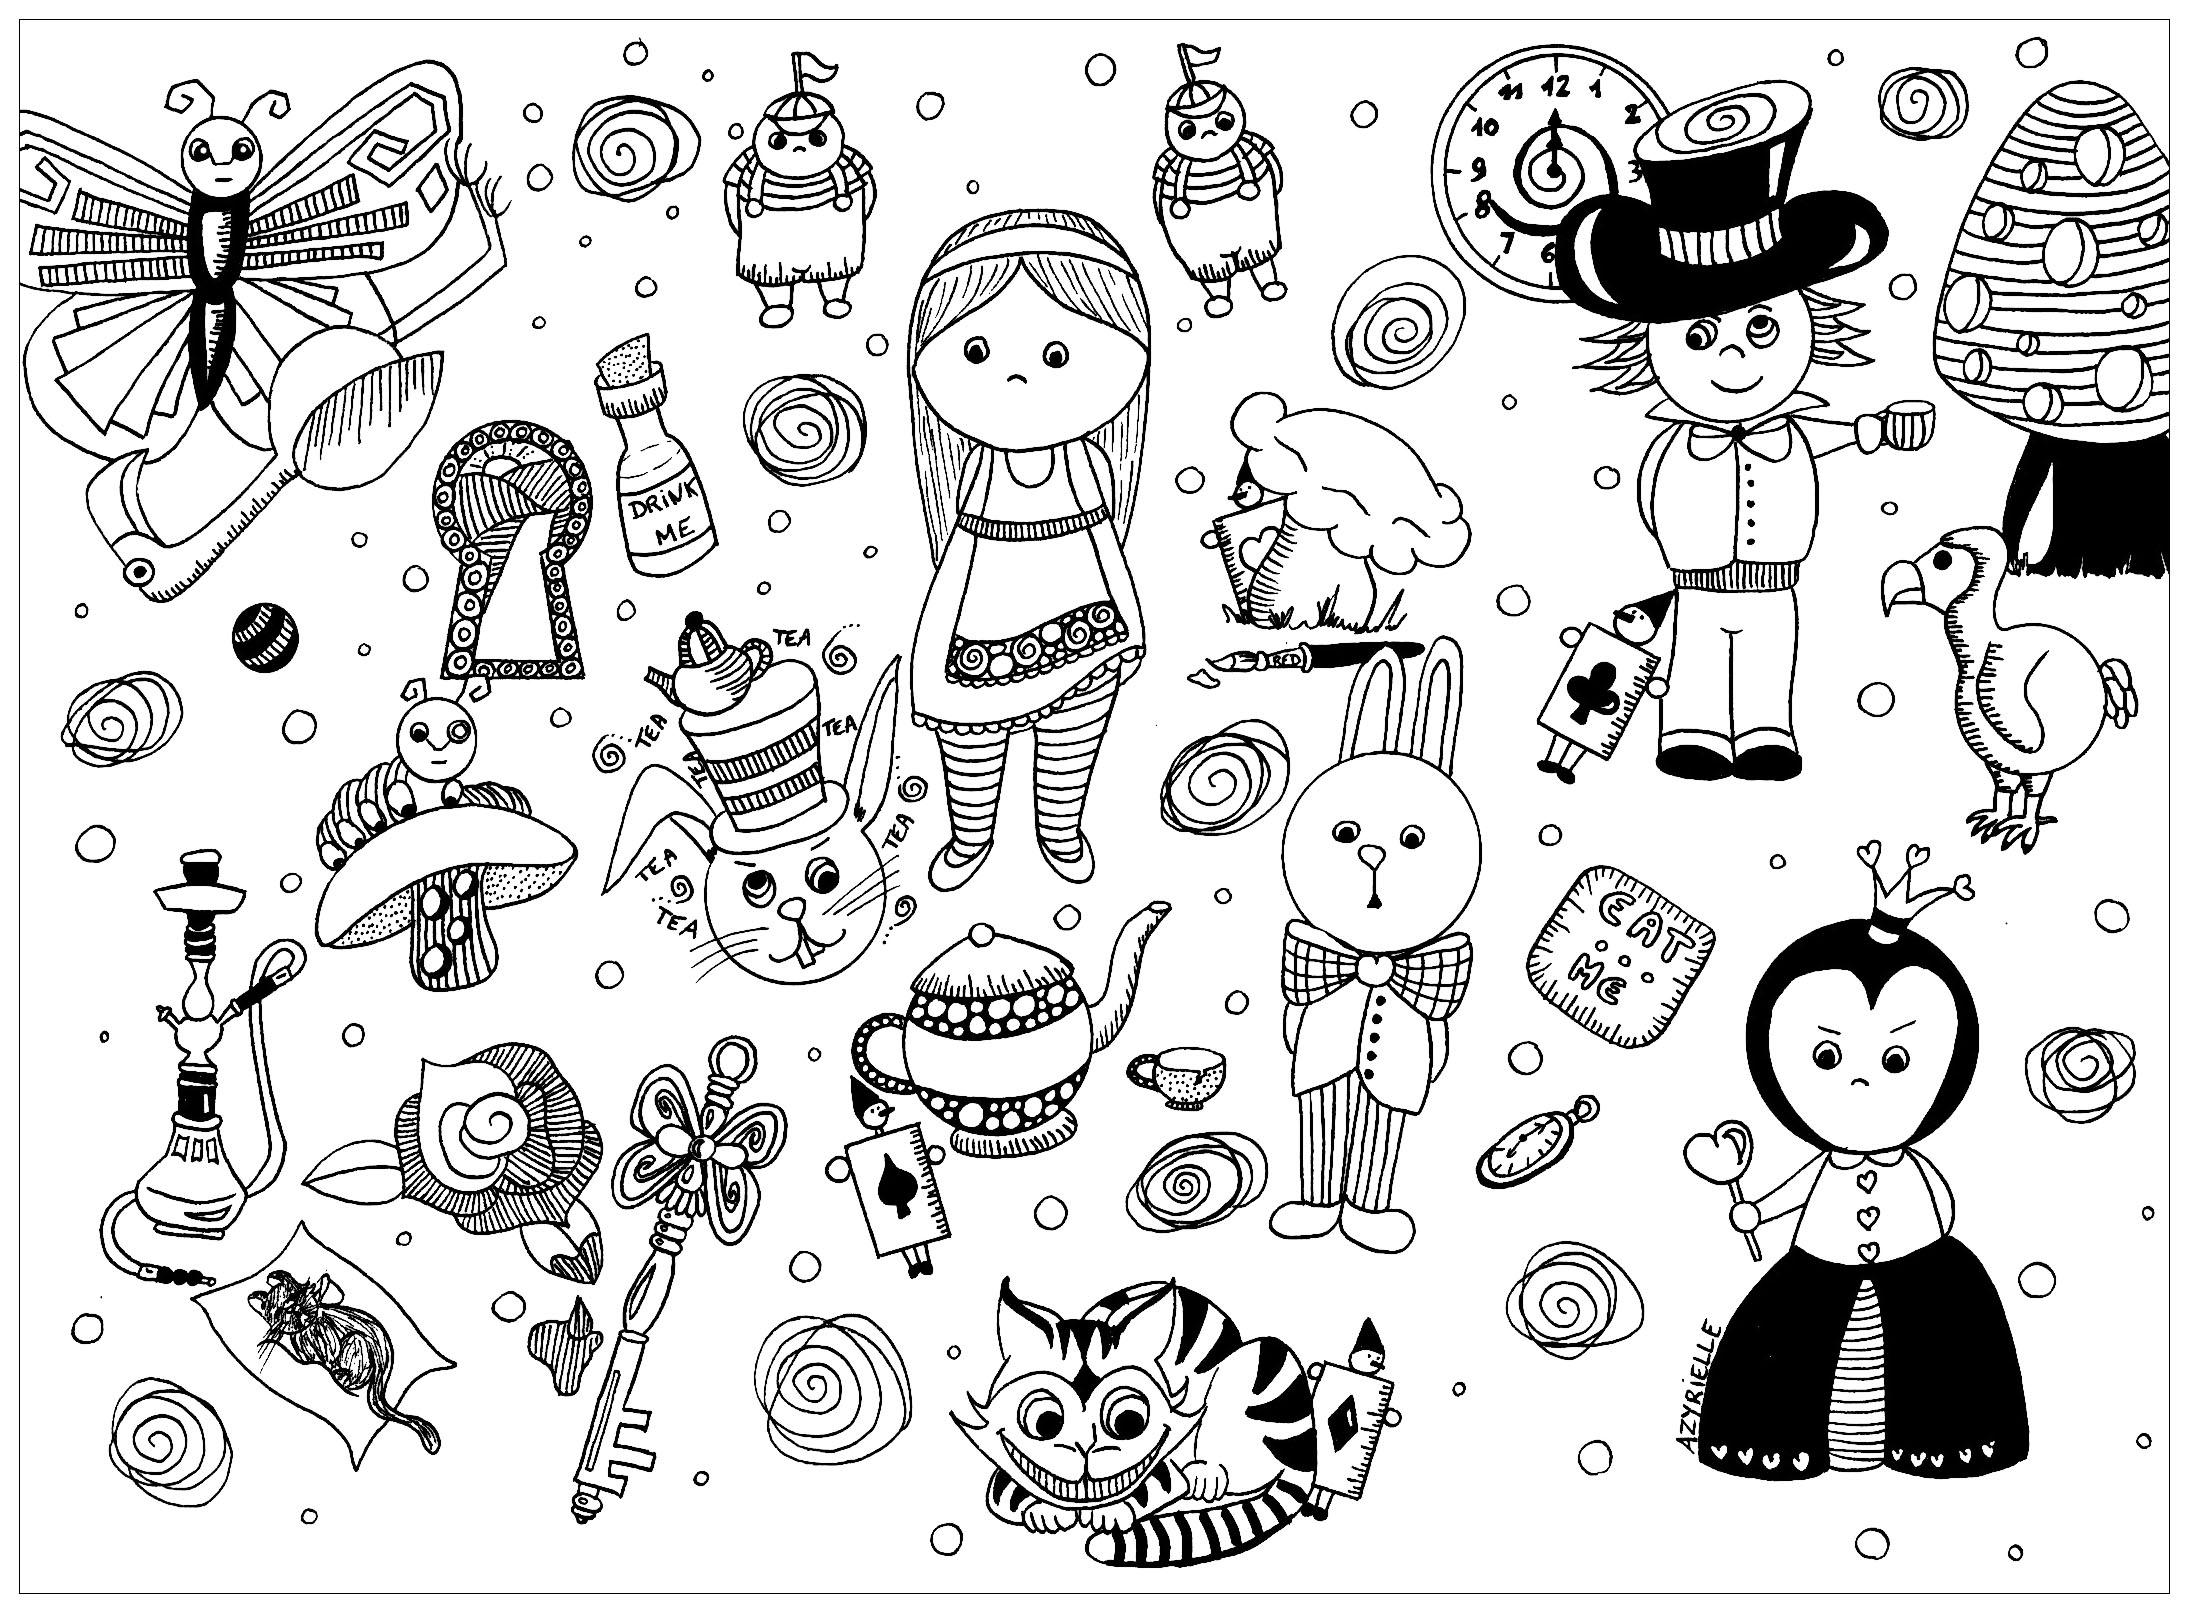 Disegni da colorare per adulti : Doodle art / Doodling - 50